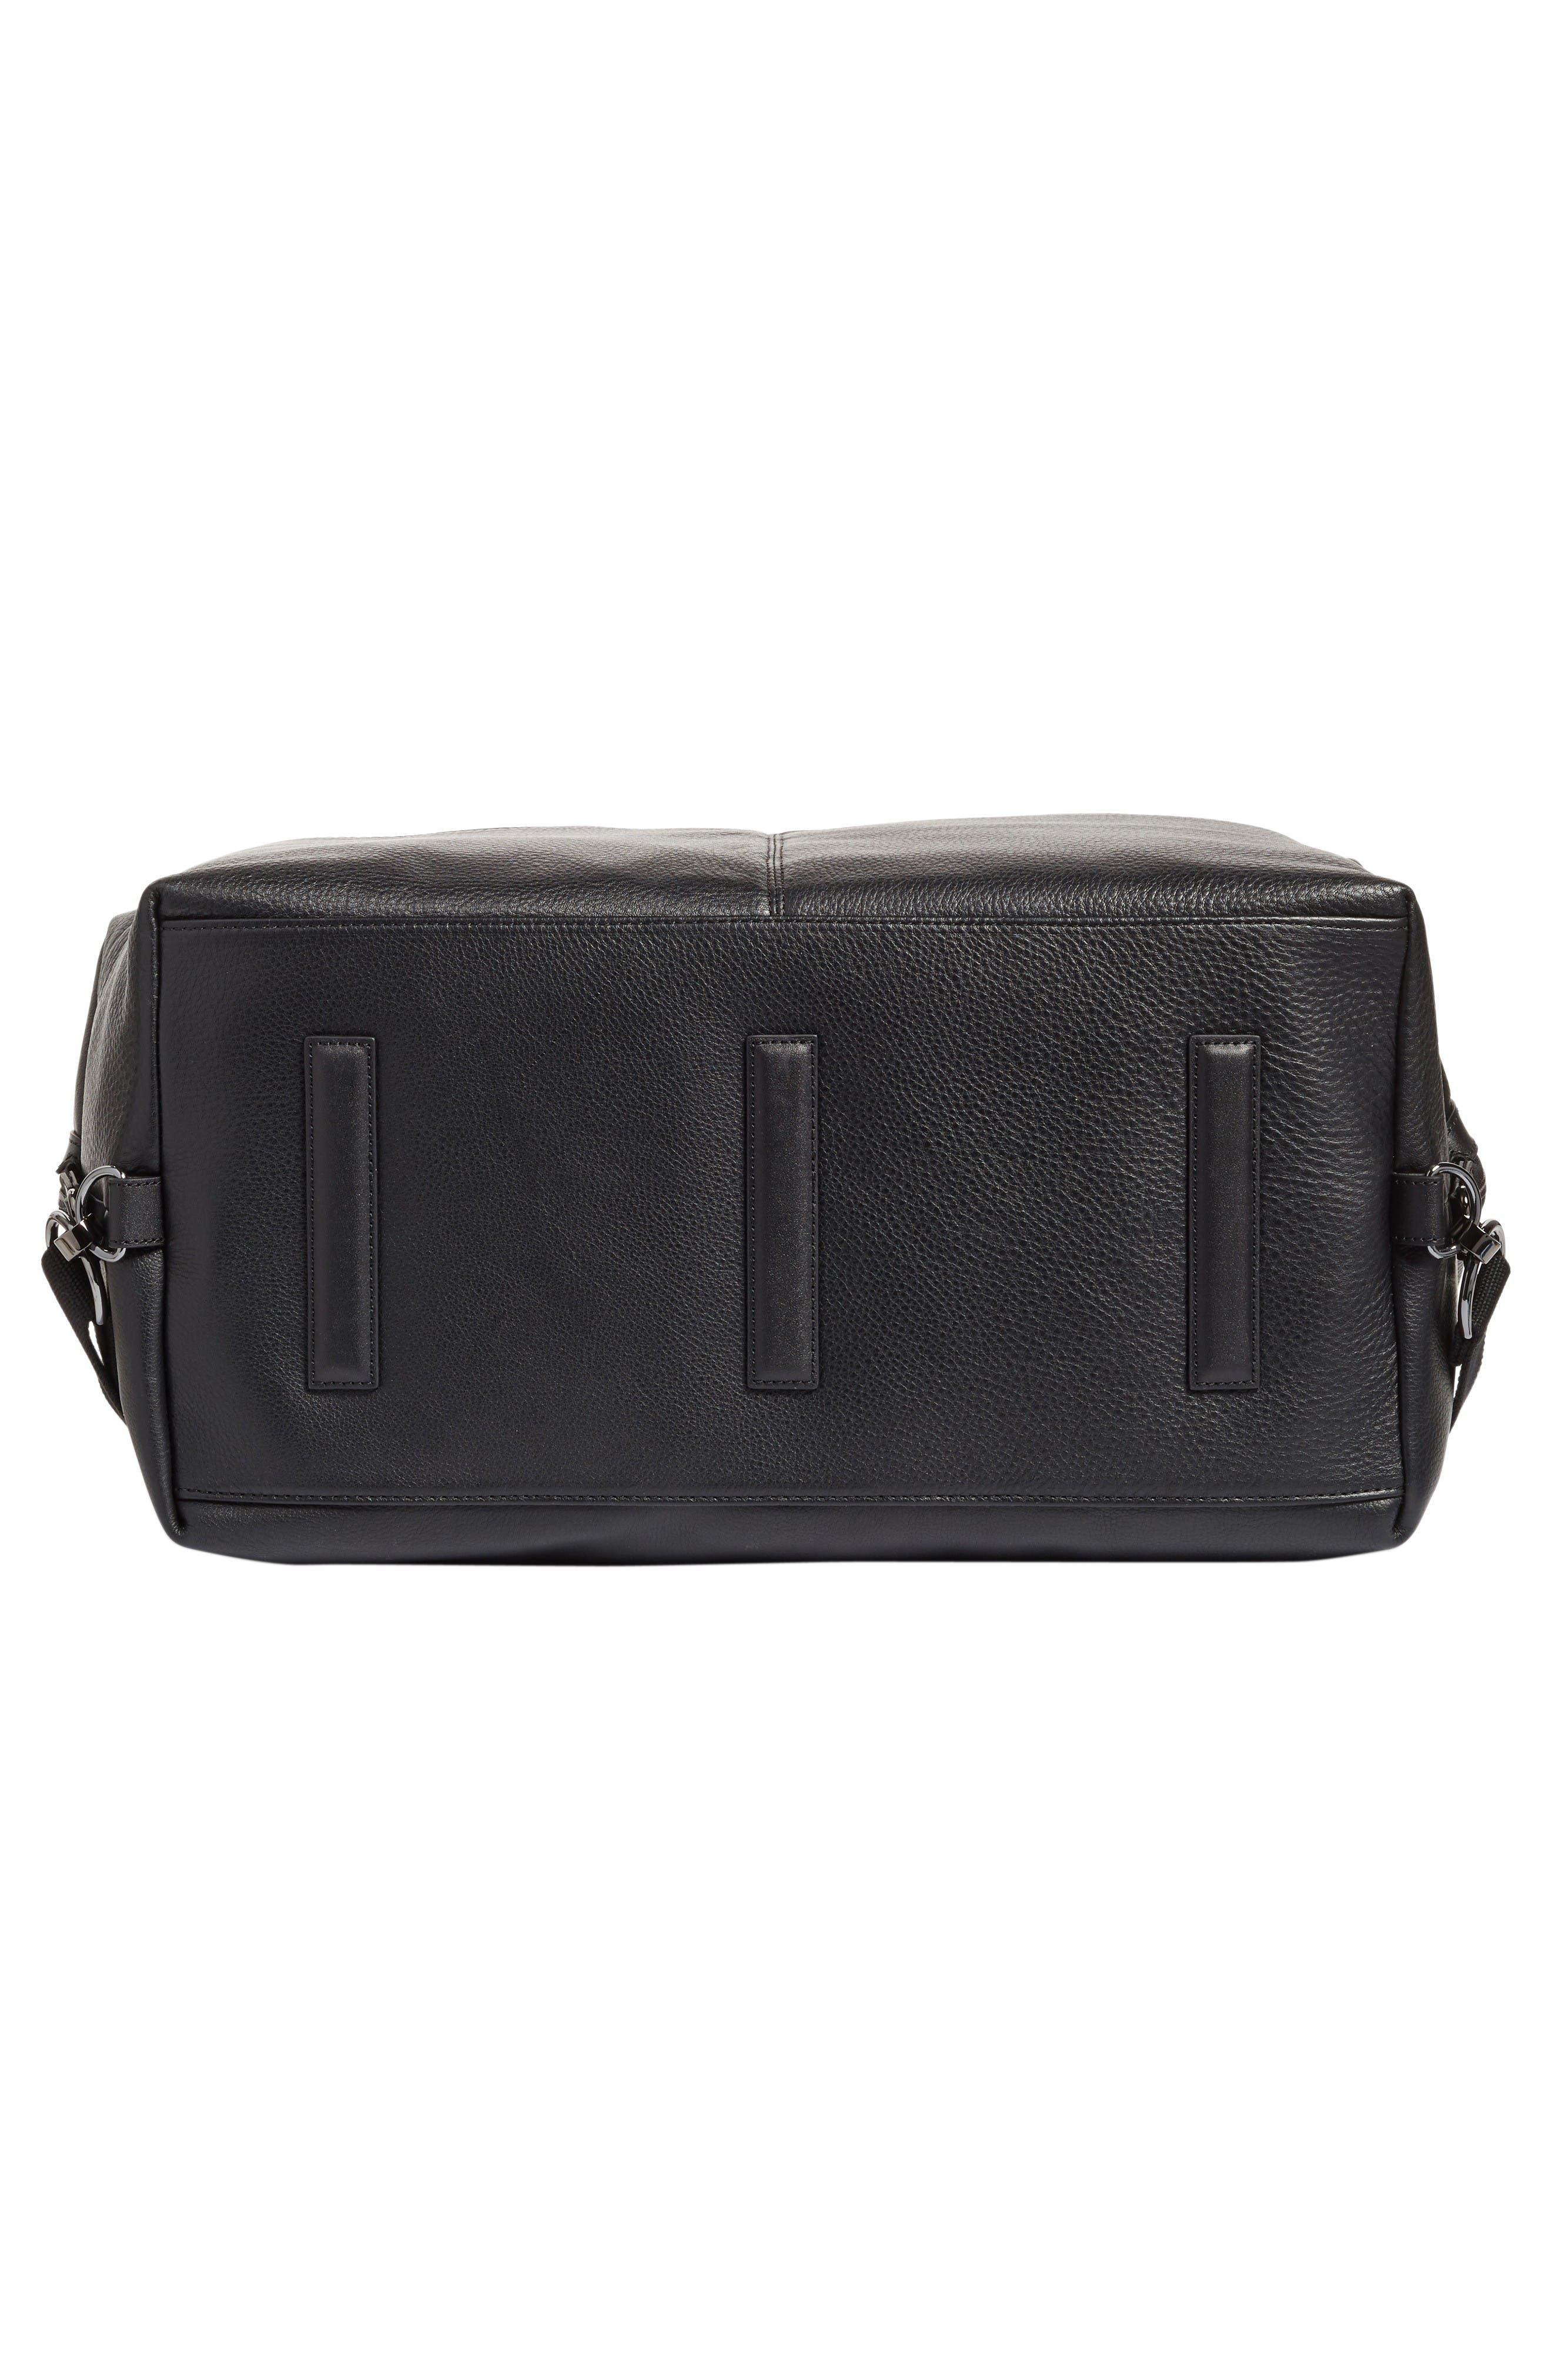 Leather Duffel Bag,                             Alternate thumbnail 6, color,                             Black